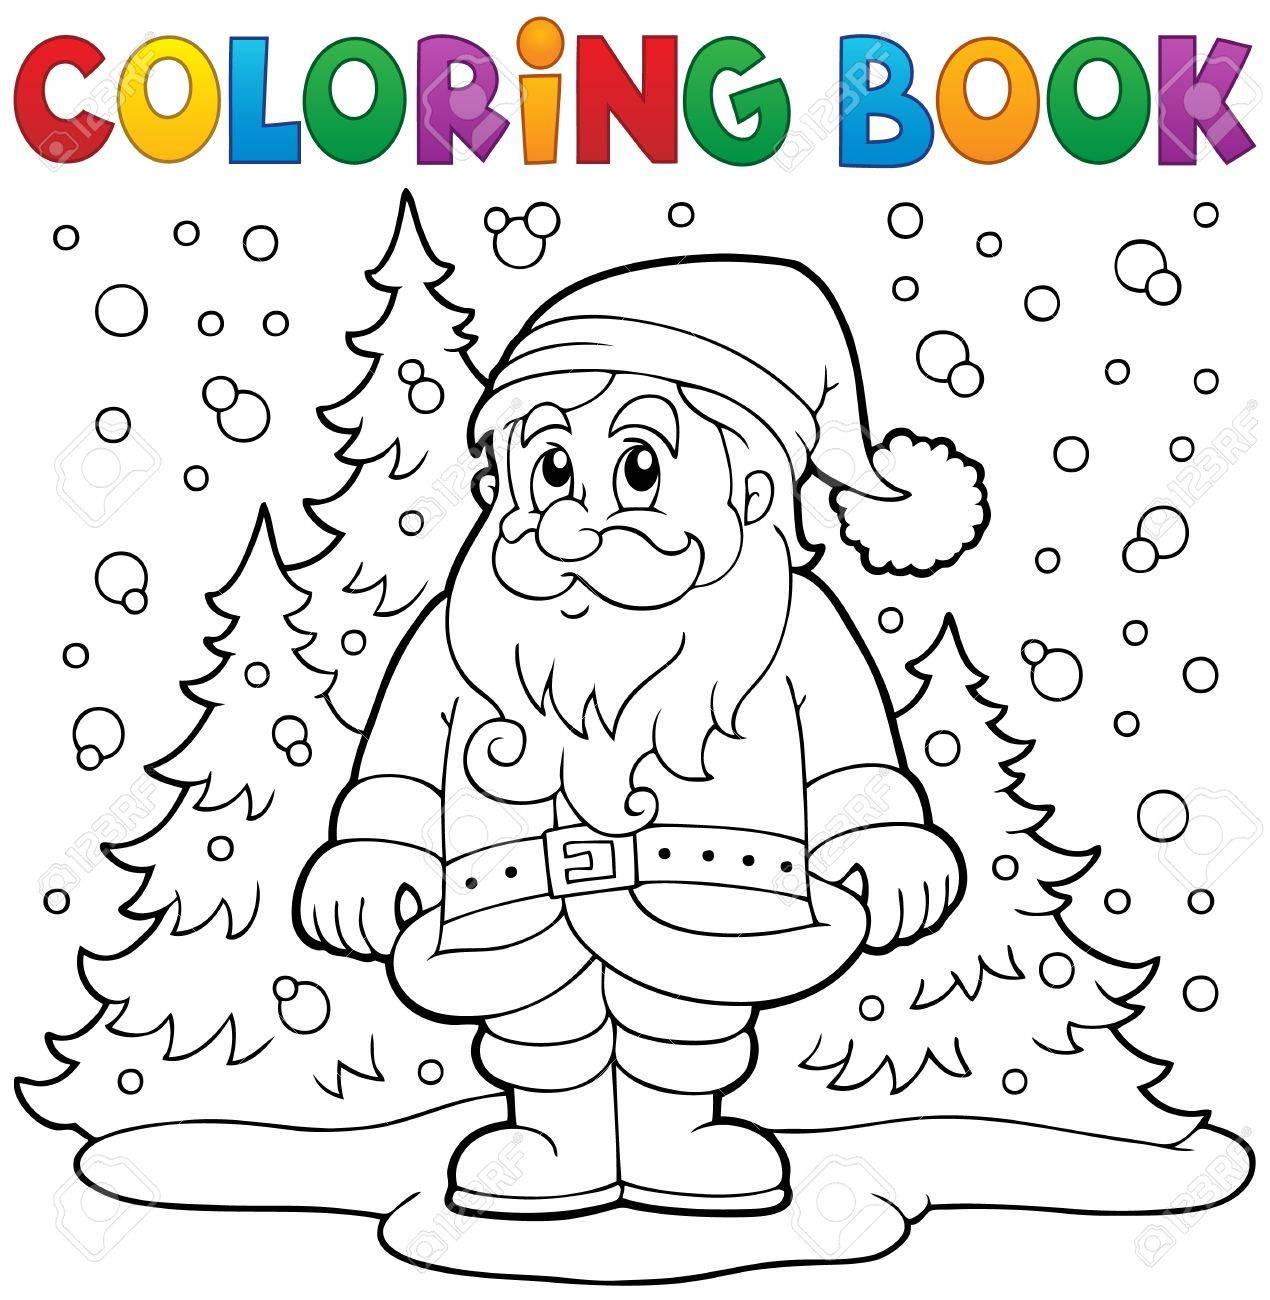 coloring book santa claus in snow 3 stock vector 34569266 - Coloring Book Santa Claus